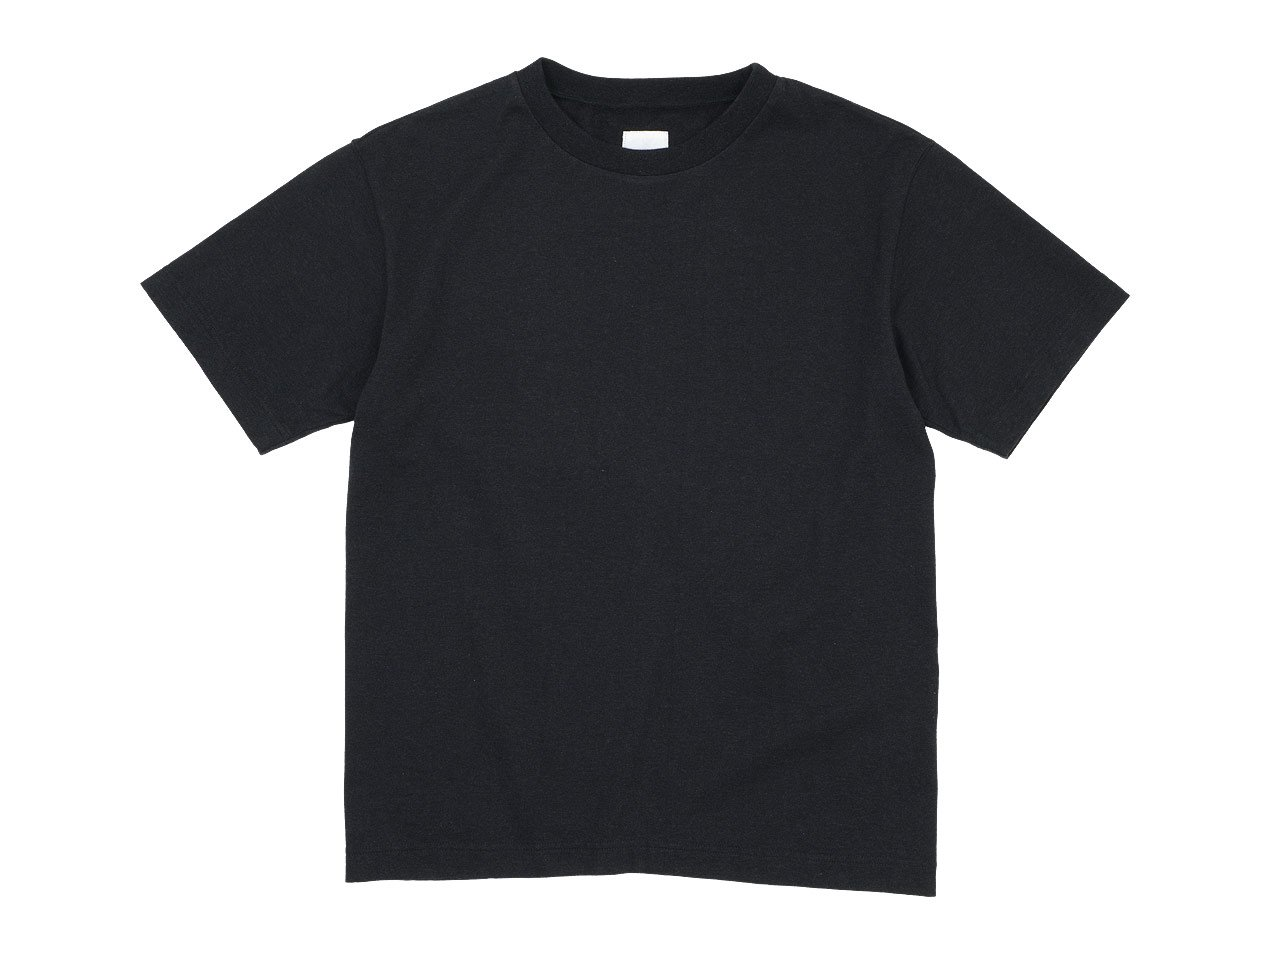 TOUJOURS Big T-shirt 98Heather Black 【LM33XC10】